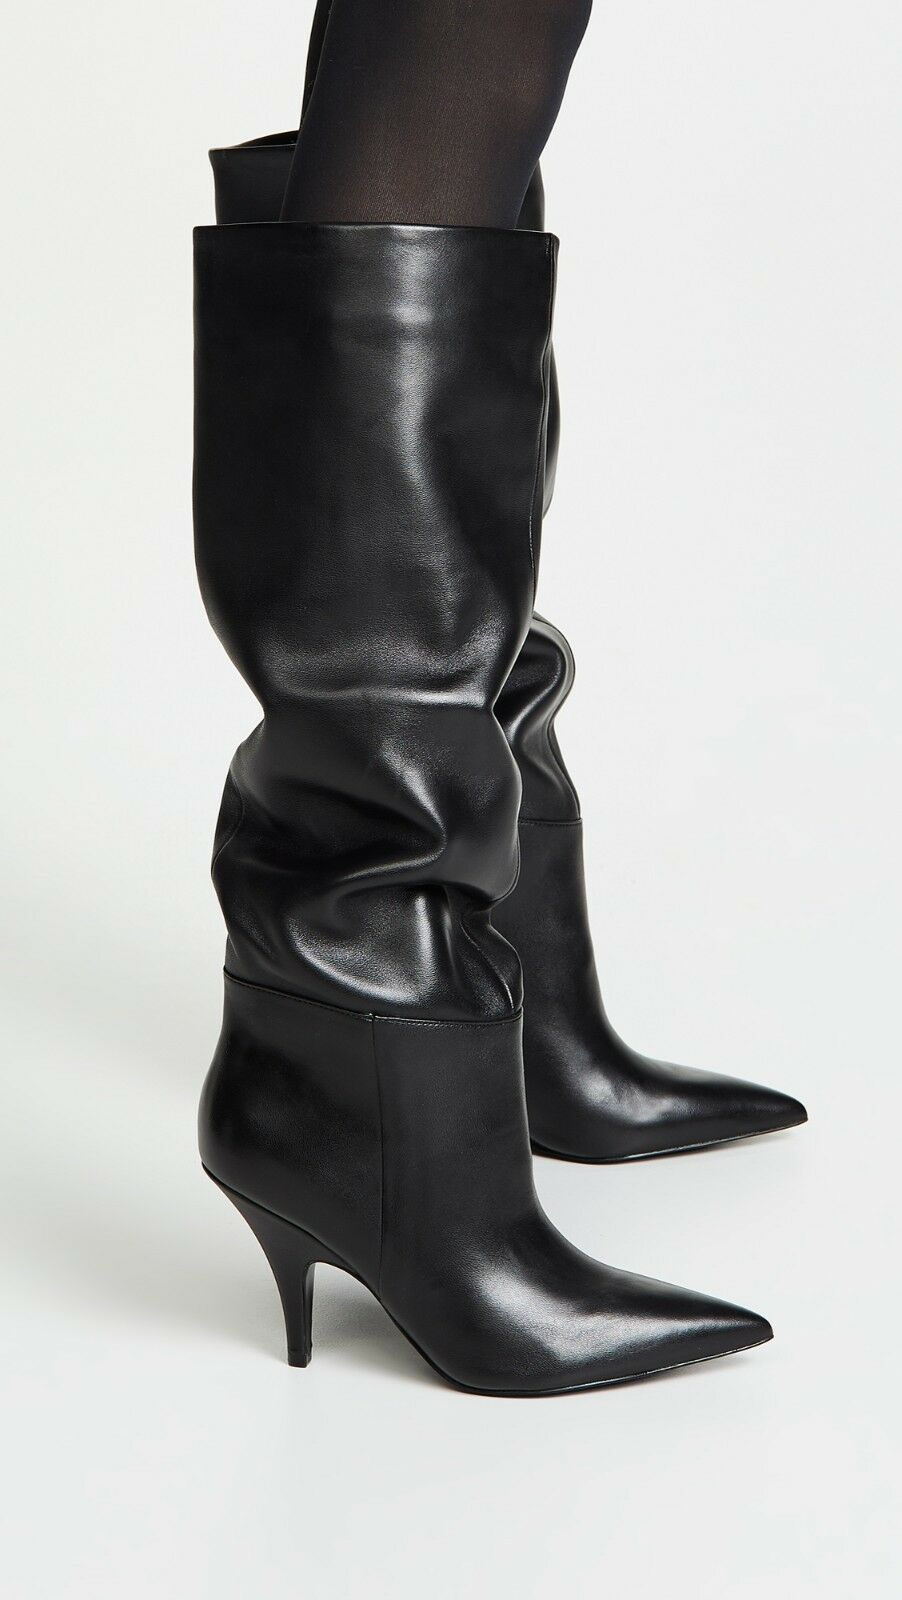 Kendall & Kylie calla Slouchy botas botas botas en Cuero Negro Tamaño 8.5M  apresurado a ver